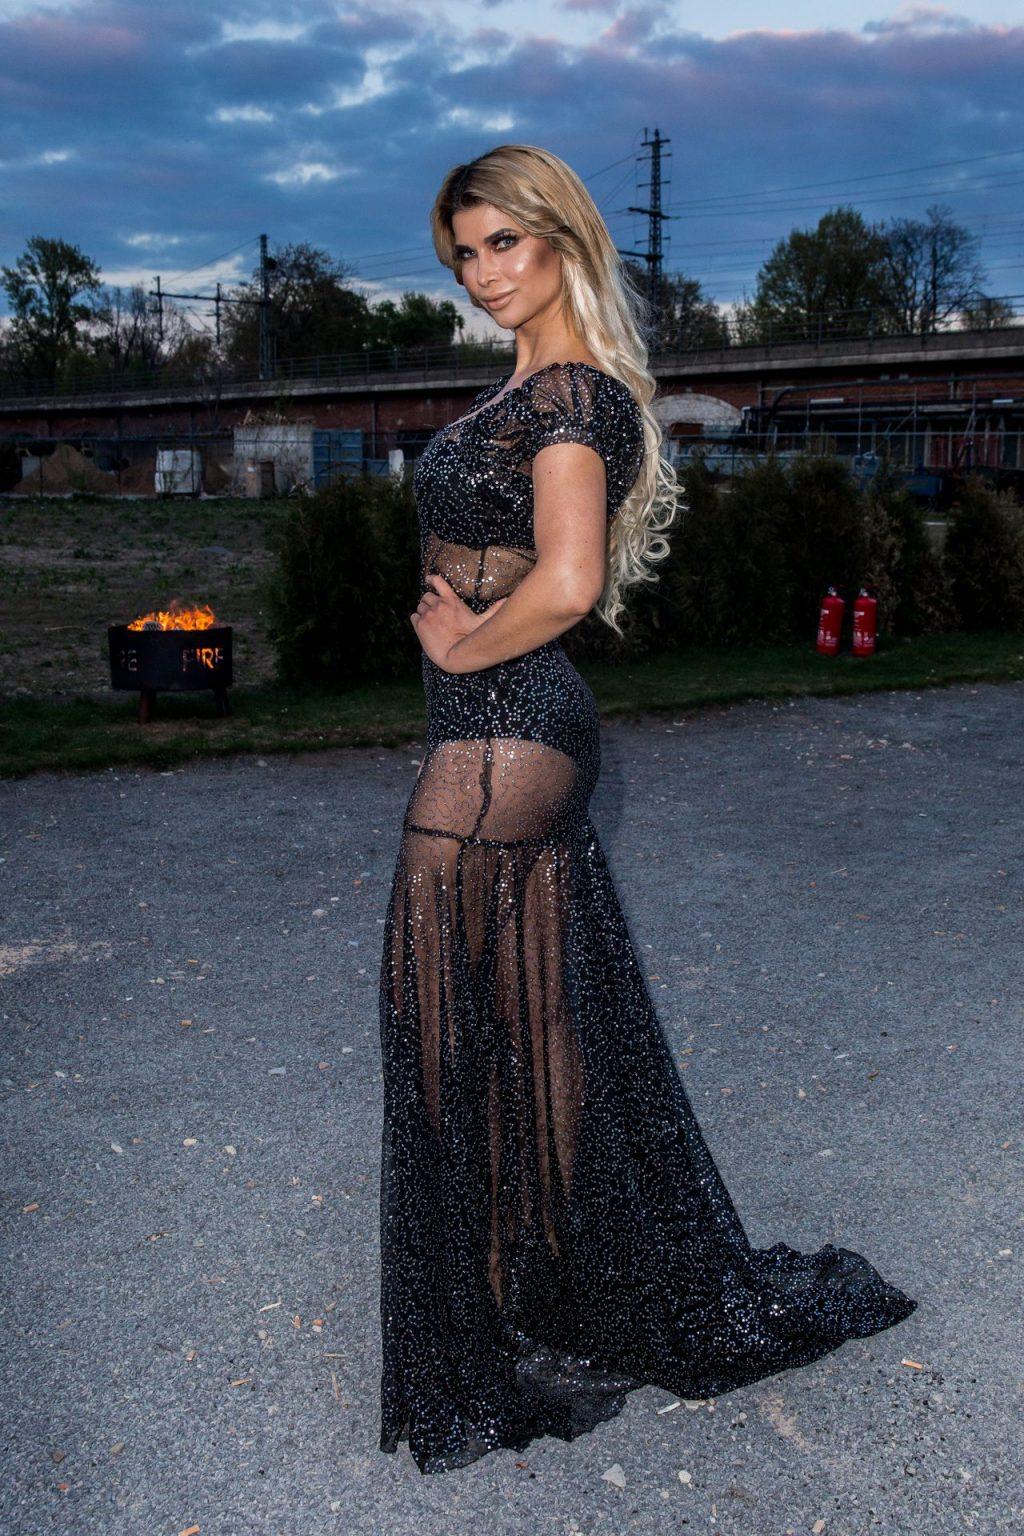 Micaela Schäfer, Yvonne Woelke Sexy (16 Photos)